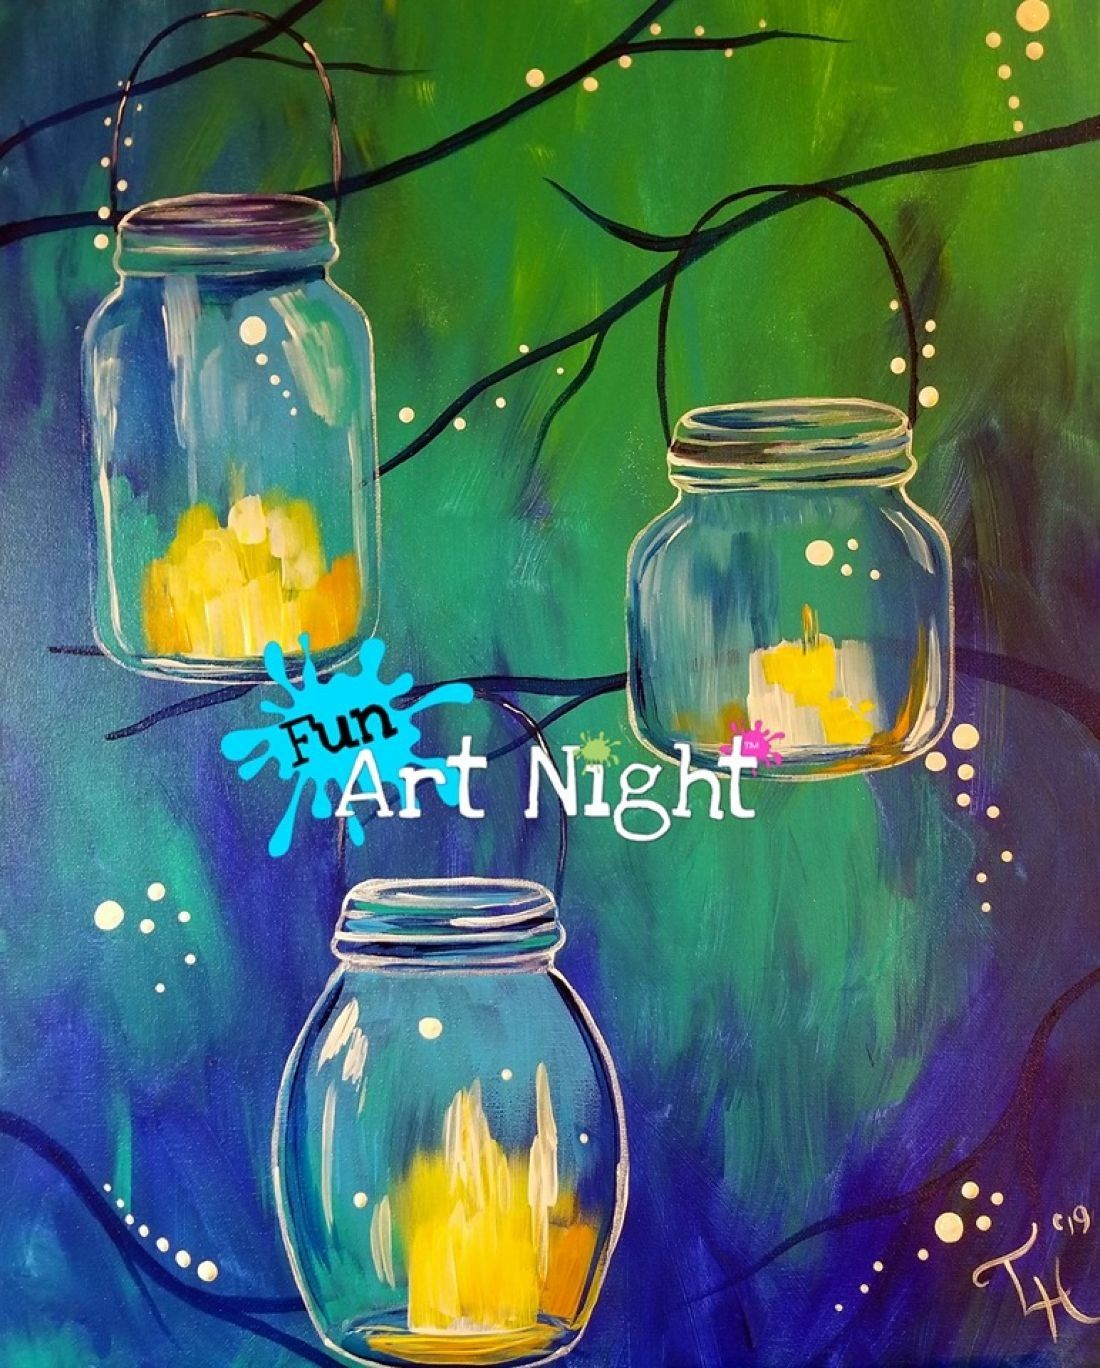 Fun Art Night Jars of Light in Waynesboro